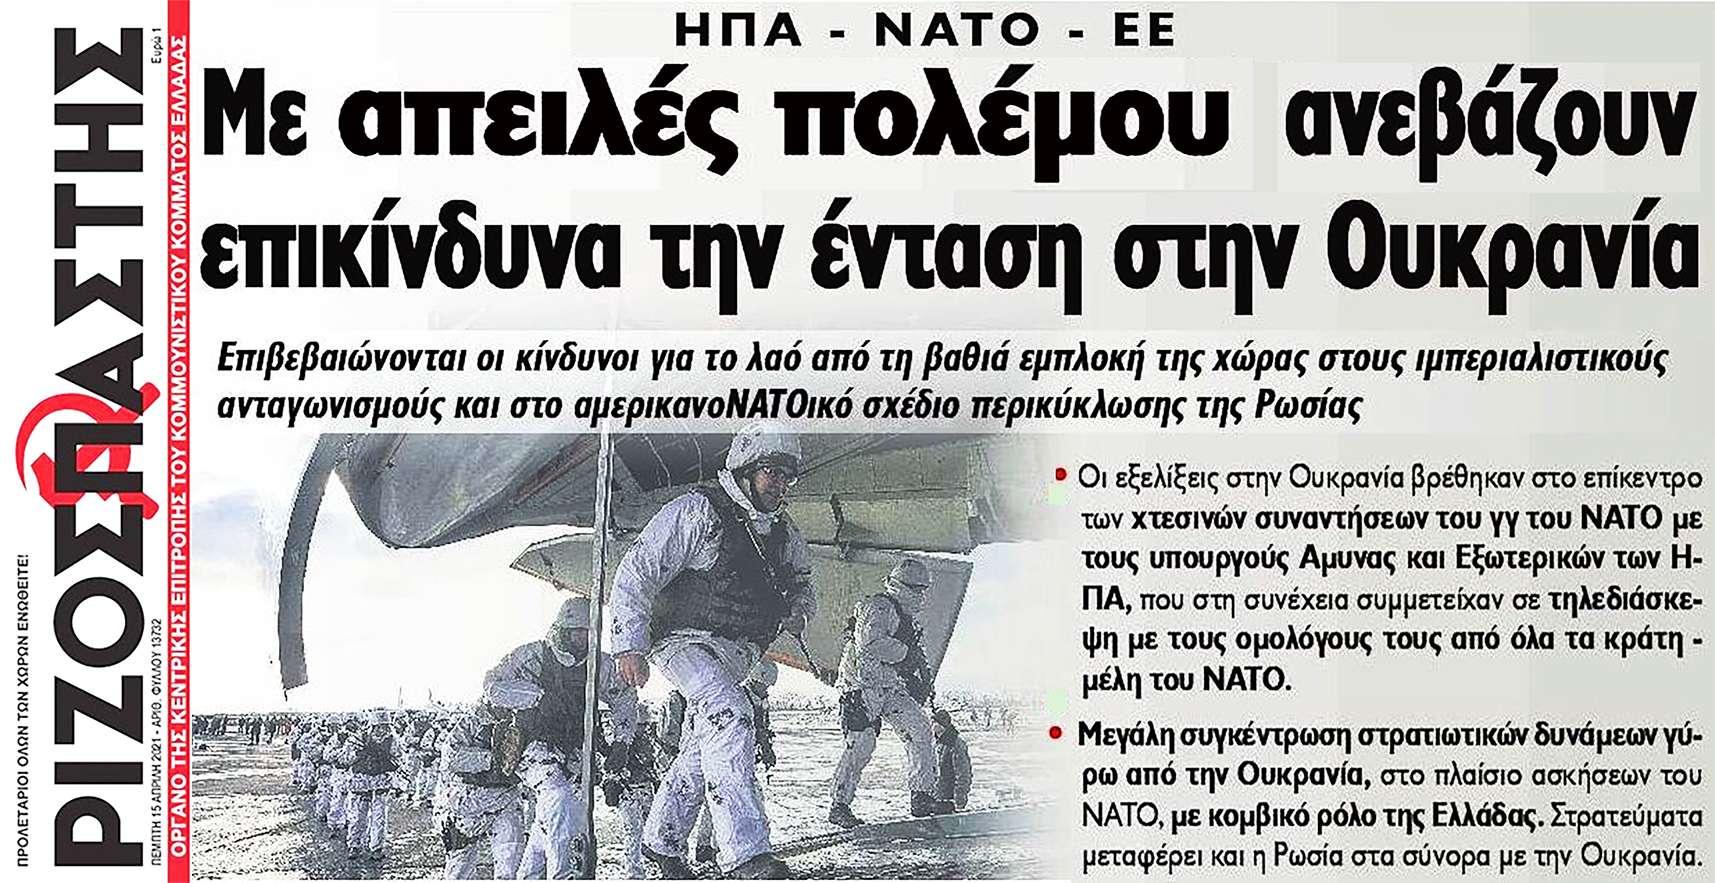 NATO OTAN Προσοχή στόχος η Ελλάδα στα παιχνίδια πολέμου